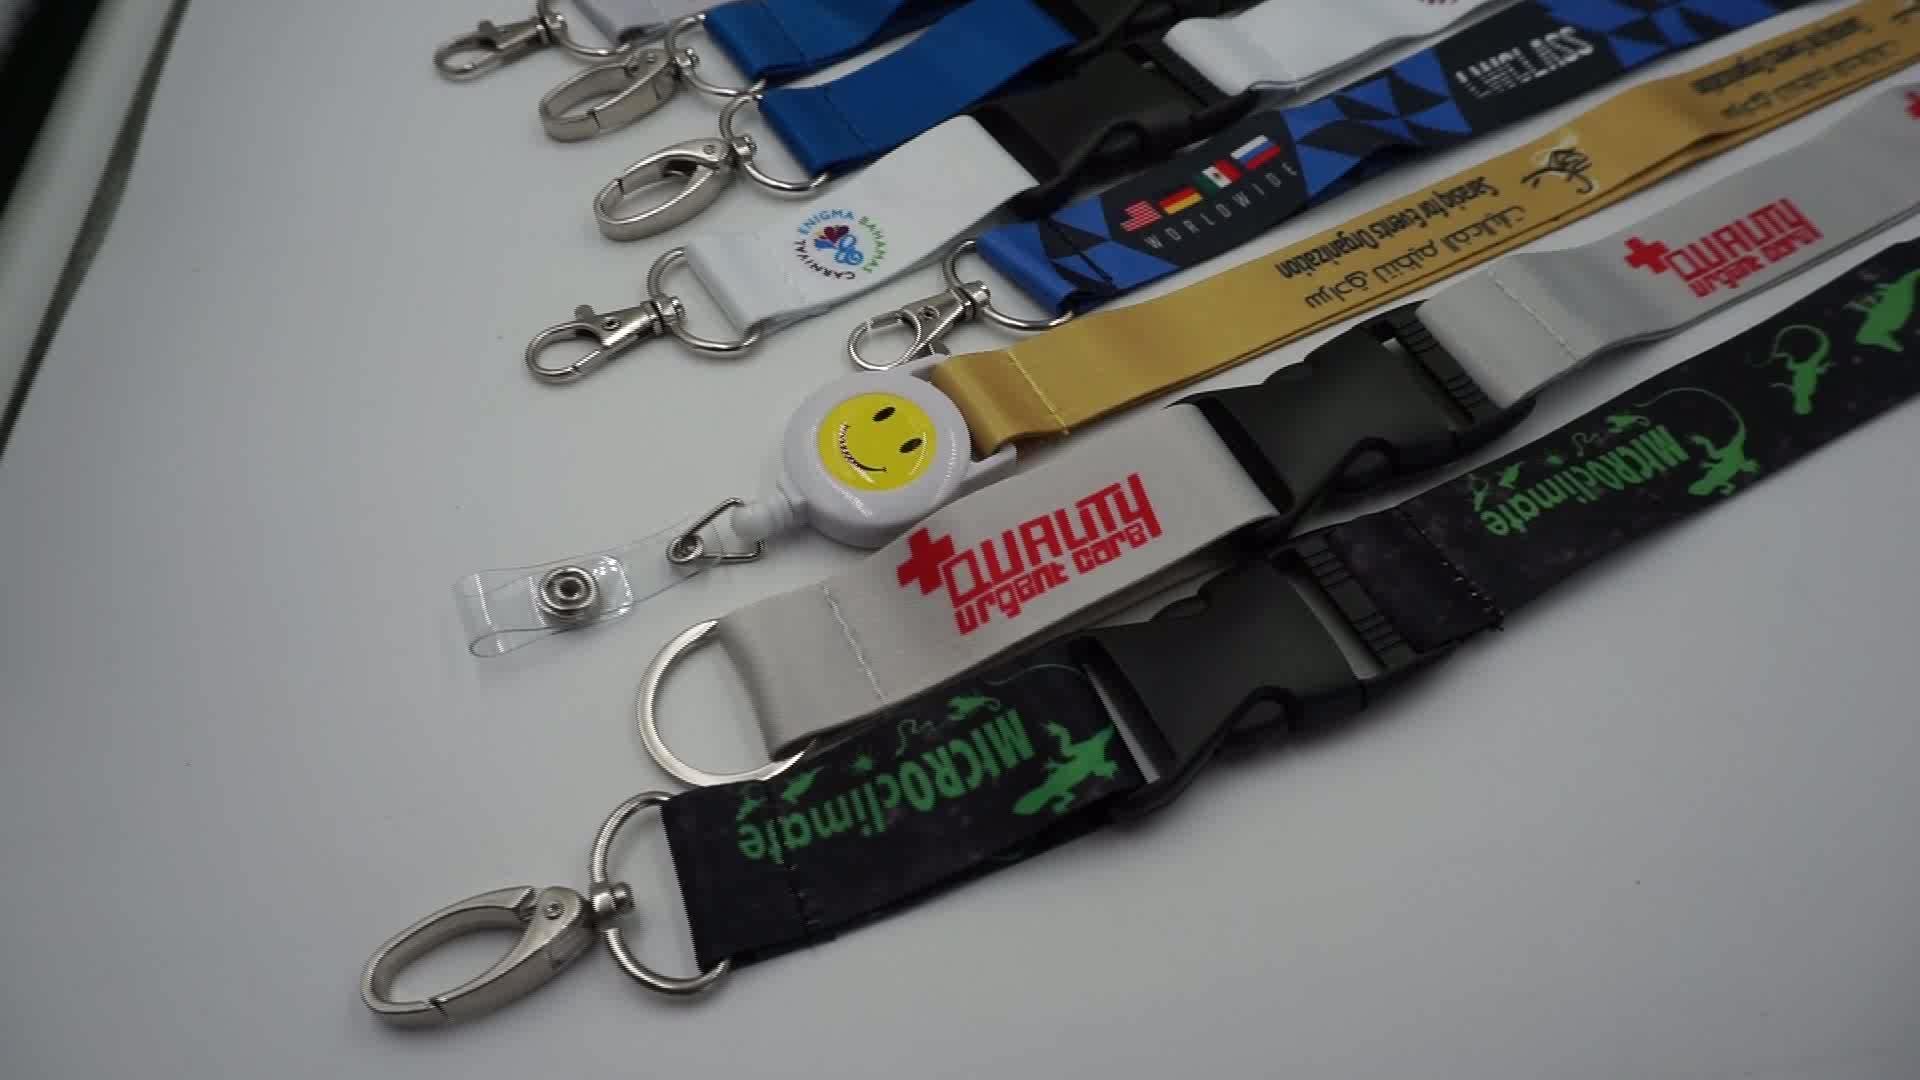 Thermal Transfer Printing Business Card/ID Card Holder Lanyard/Luggage Belt